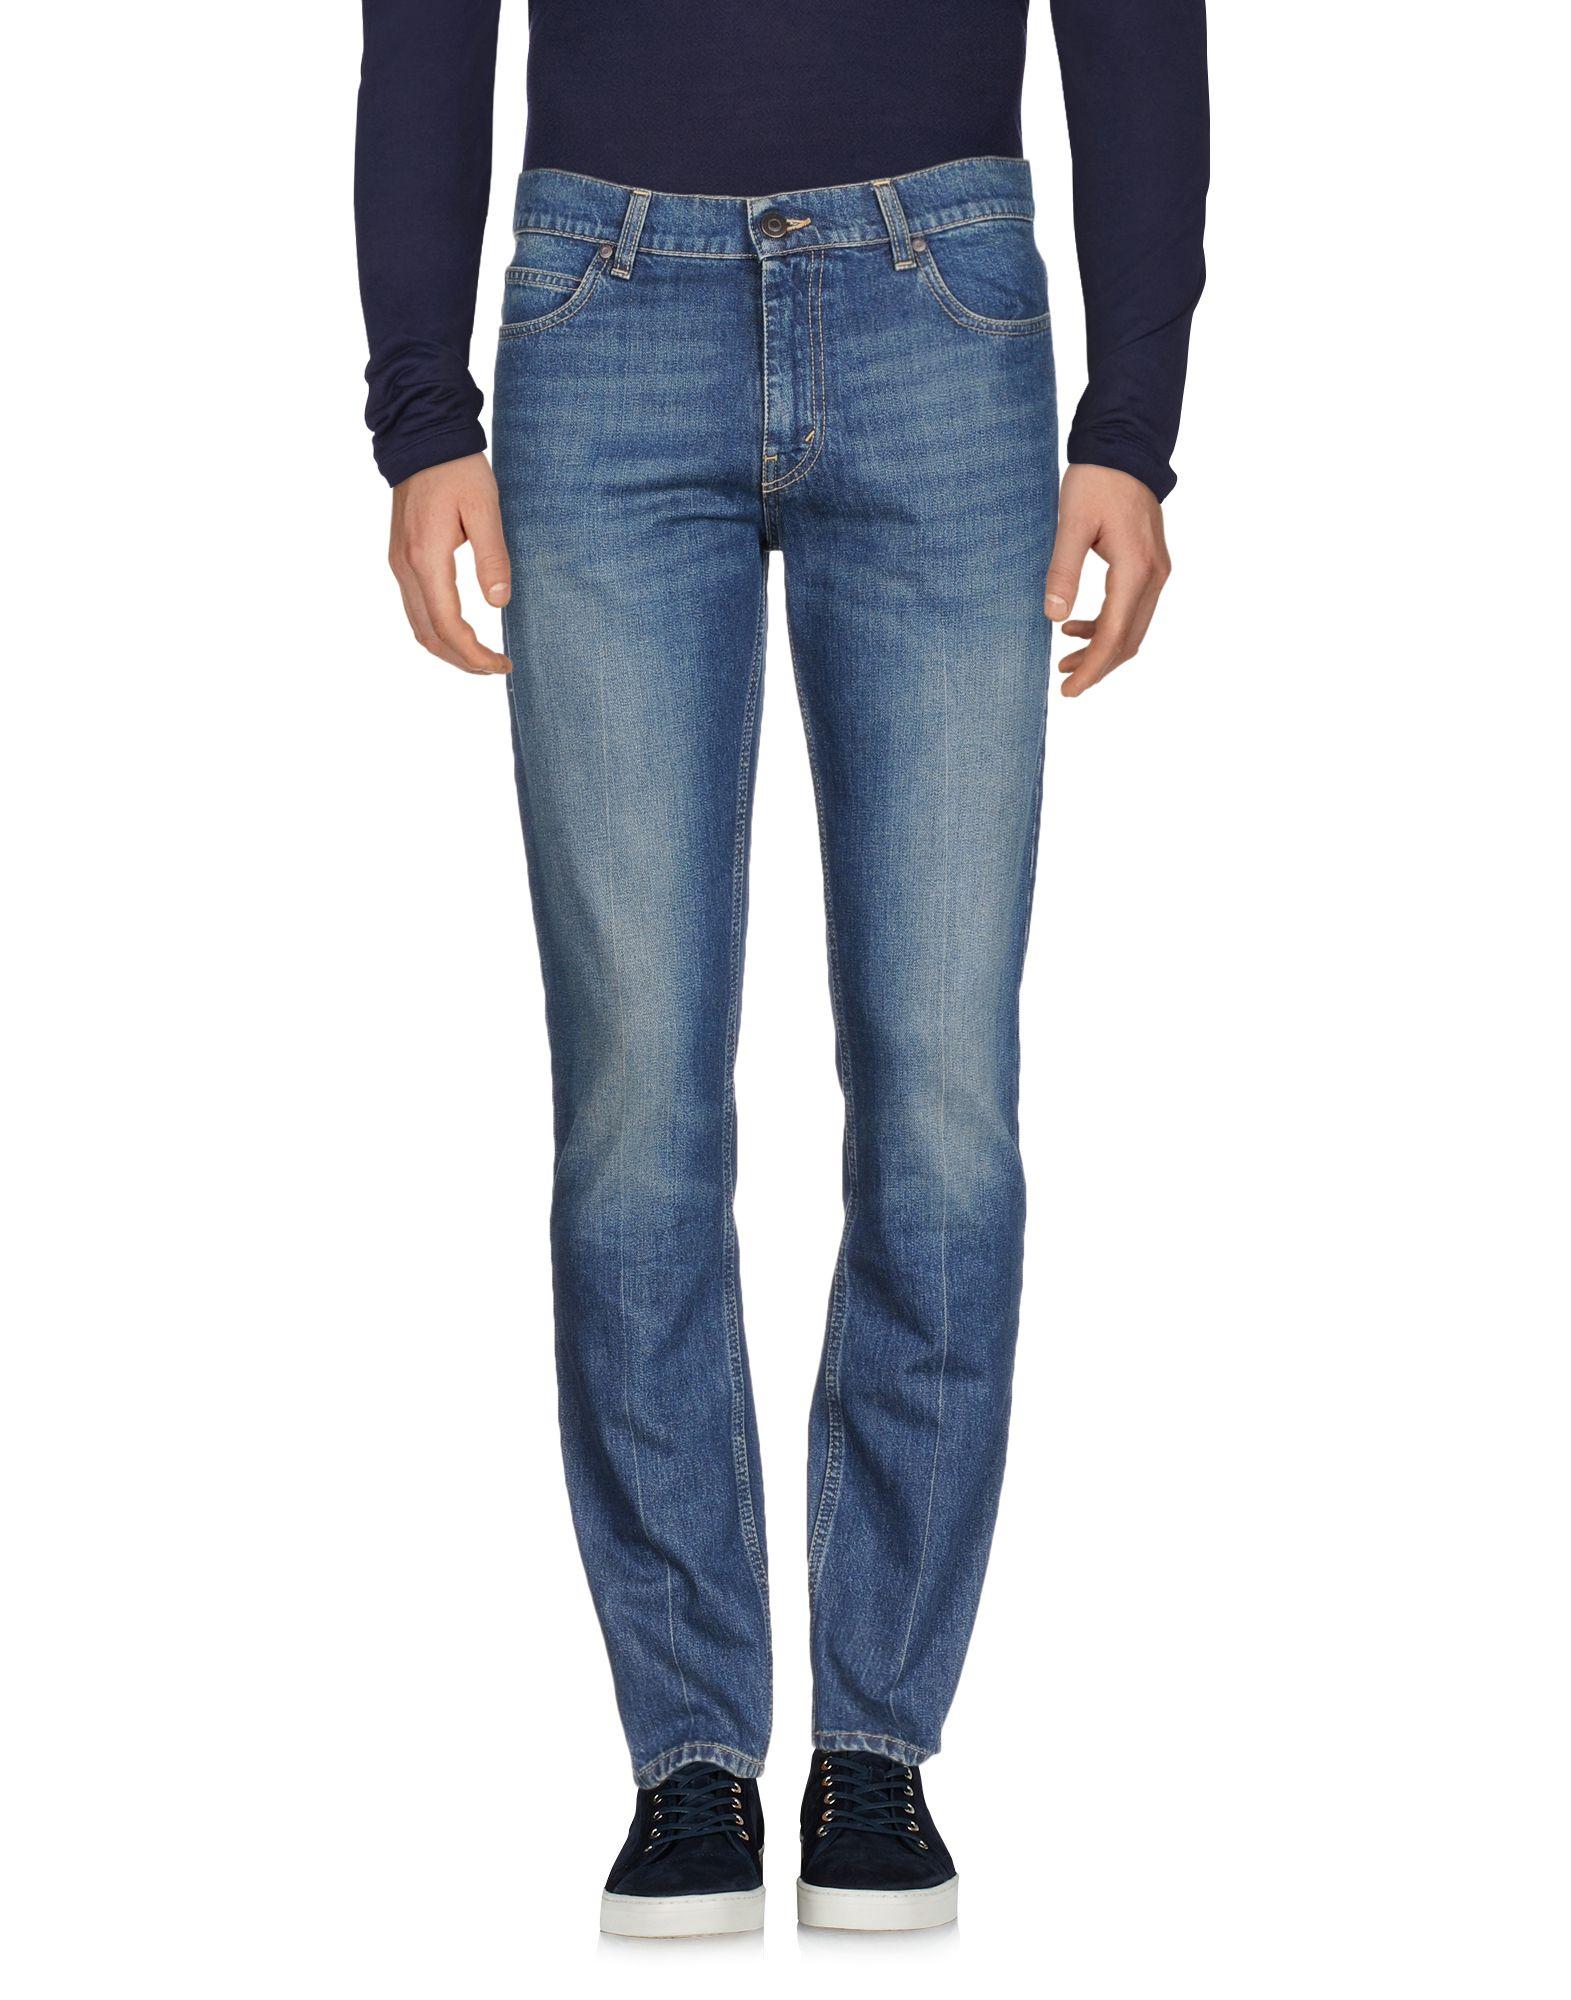 Pantaloni Jeans Stella Mccartney Donna - Acquista online su